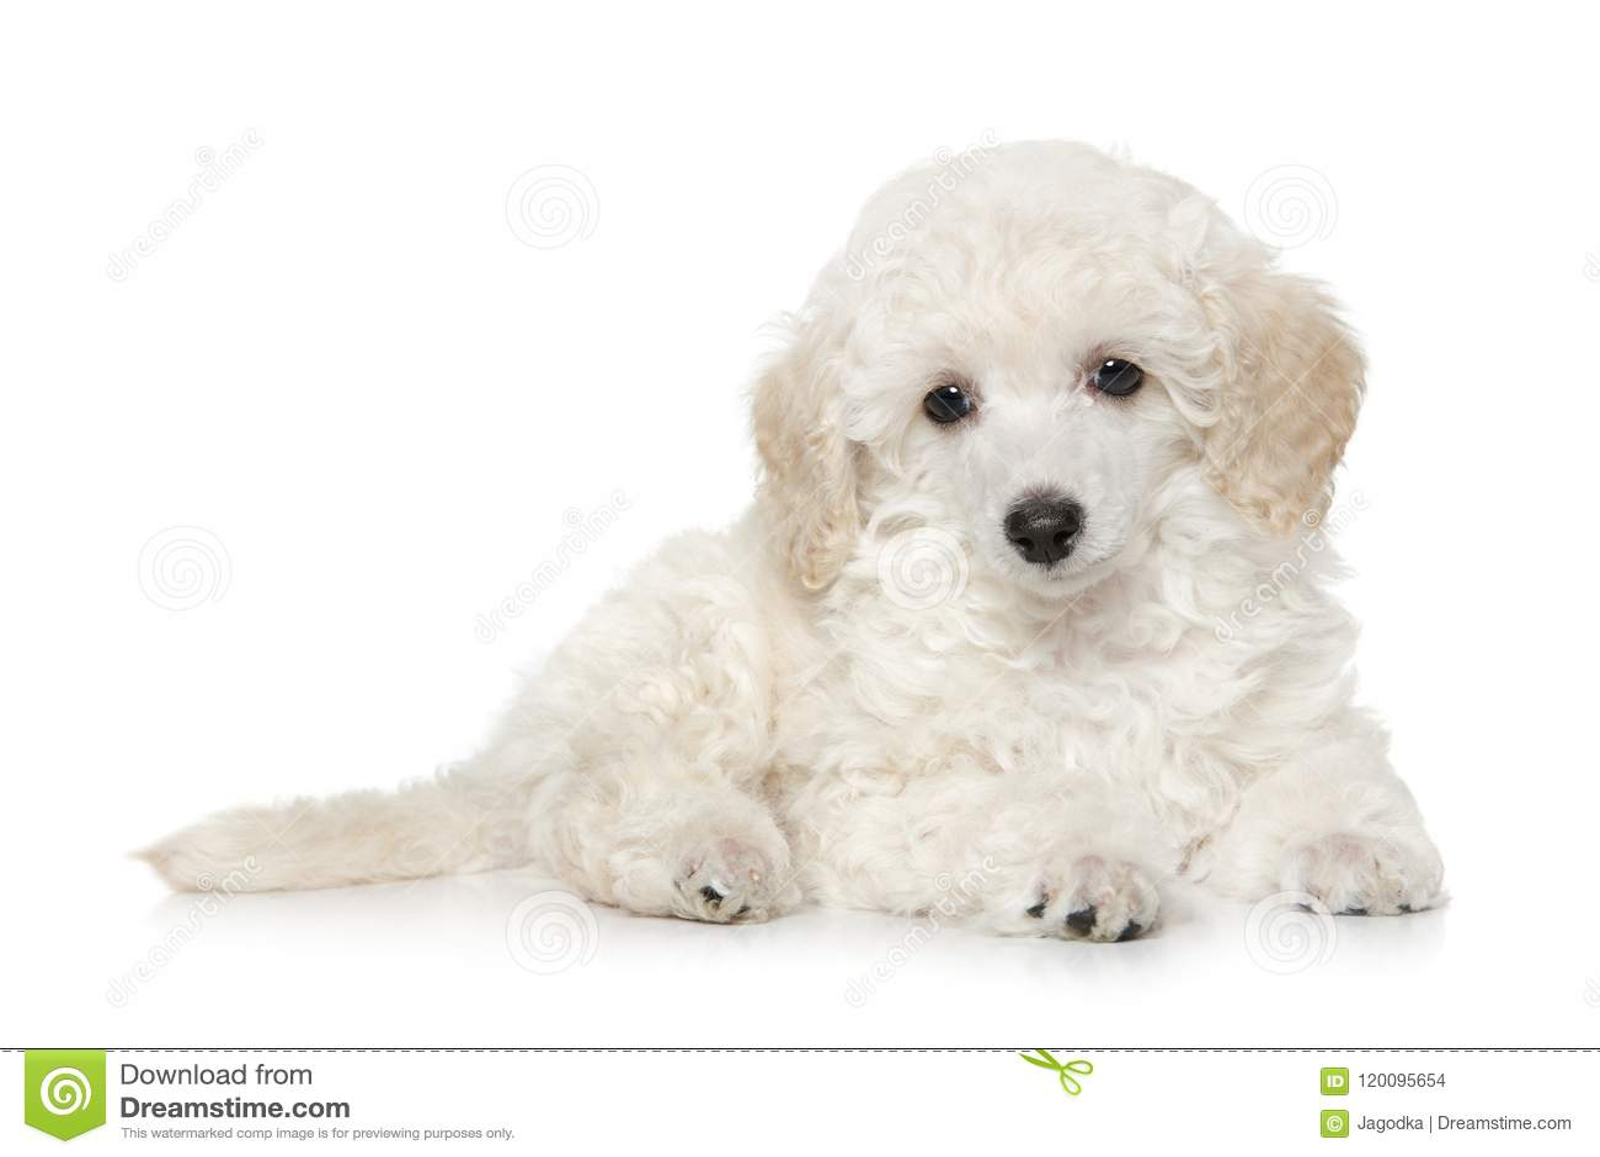 White Toy Poodle Puppy On White Background Stock Photo Image Of Miniature Lying 120095654